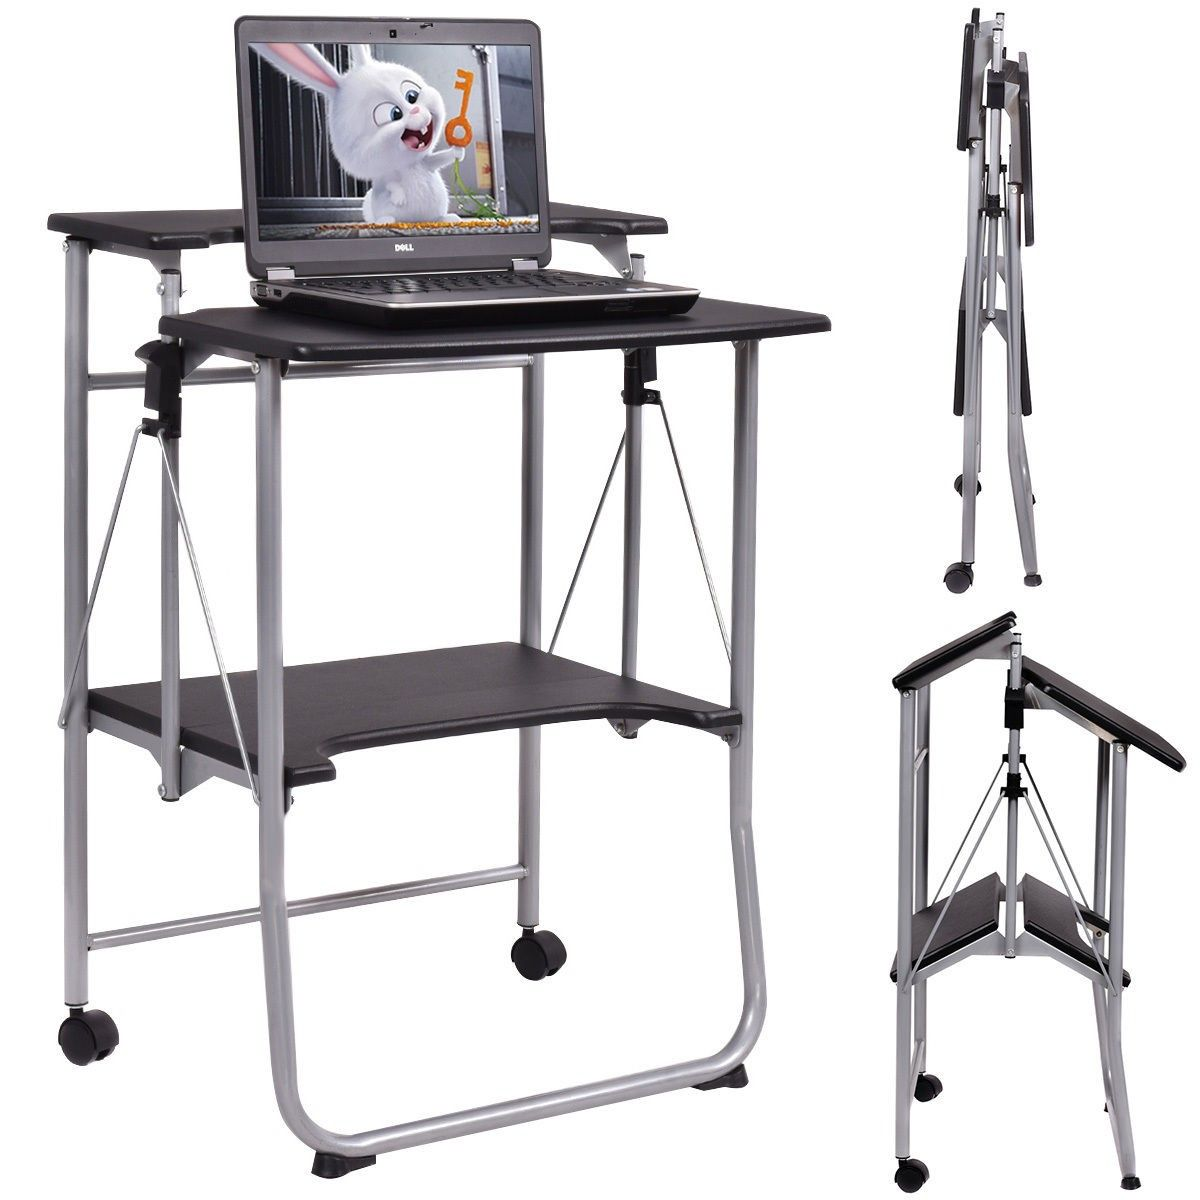 Costway Folding Computer Desk Laptop Pc Table Workstation Study Writing Desk W 2 Wheels Folding Computer Desk Folding Chair Desk